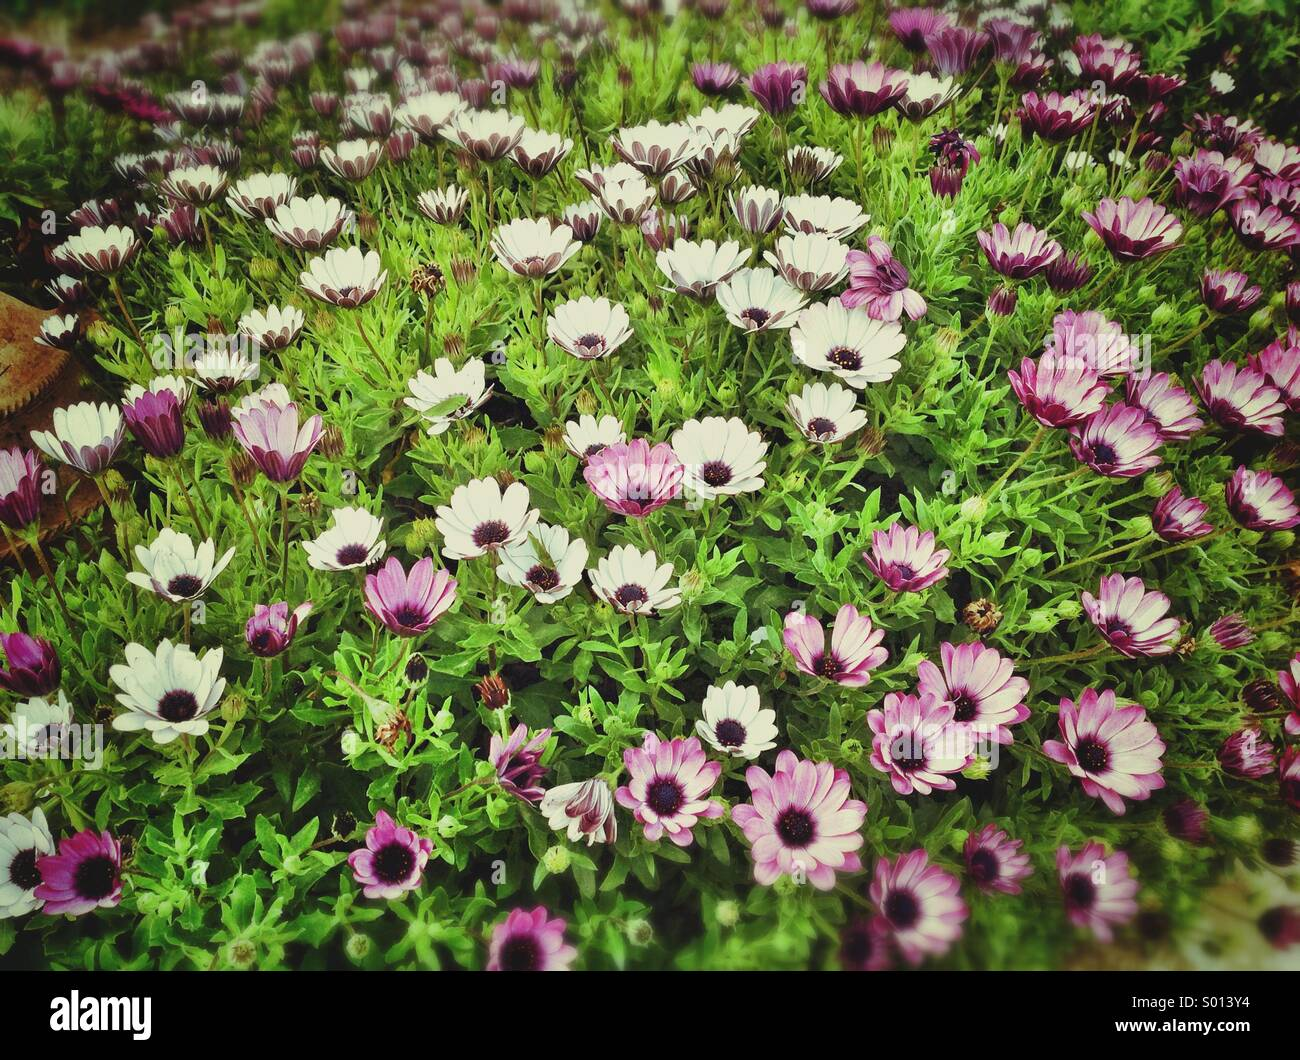 Bed of Margarita flowers, flowering abundant. - Stock Image